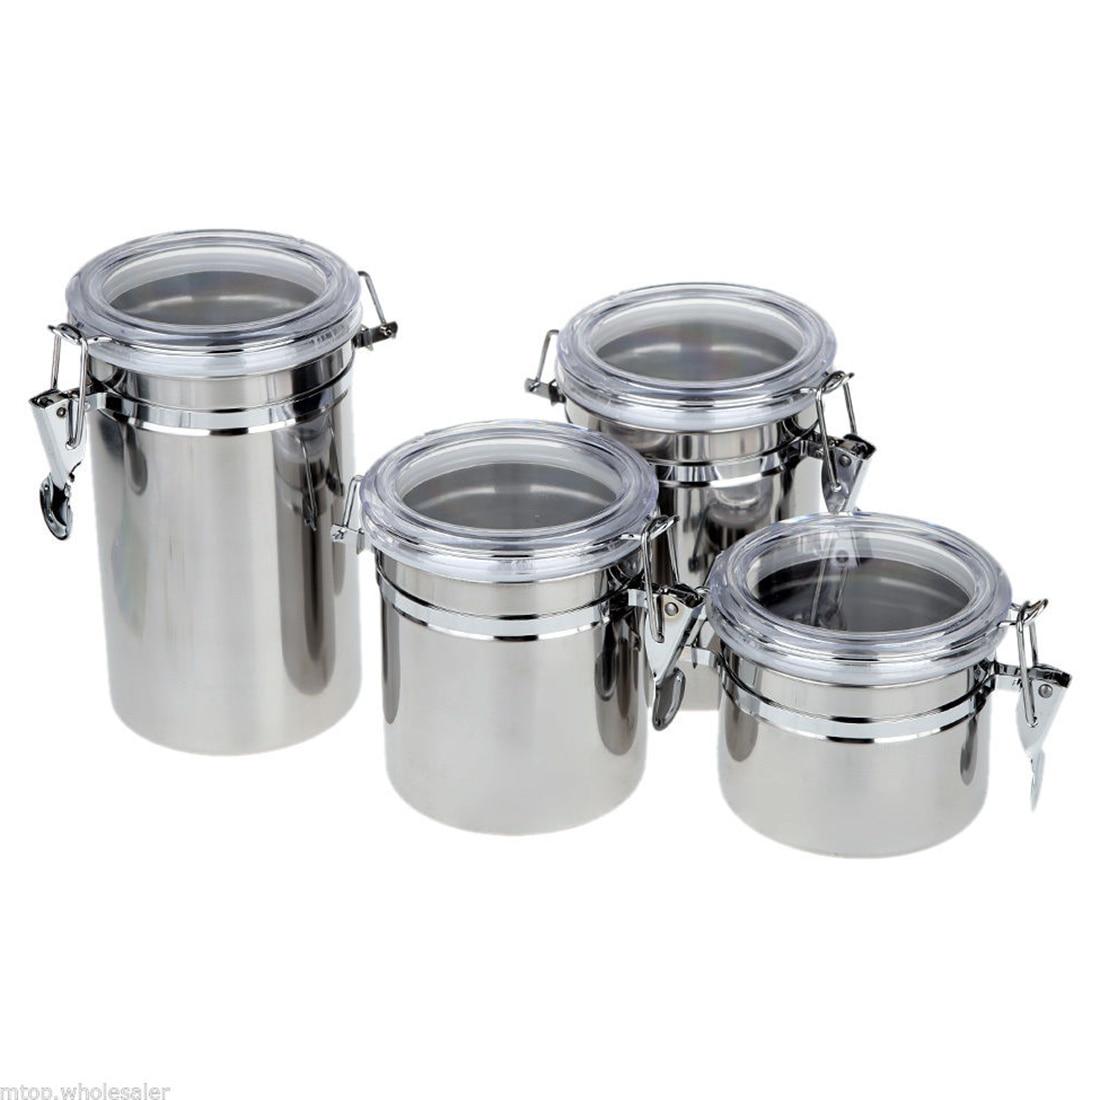 Spice, Set, Pots, Jar, pcs, Organizer